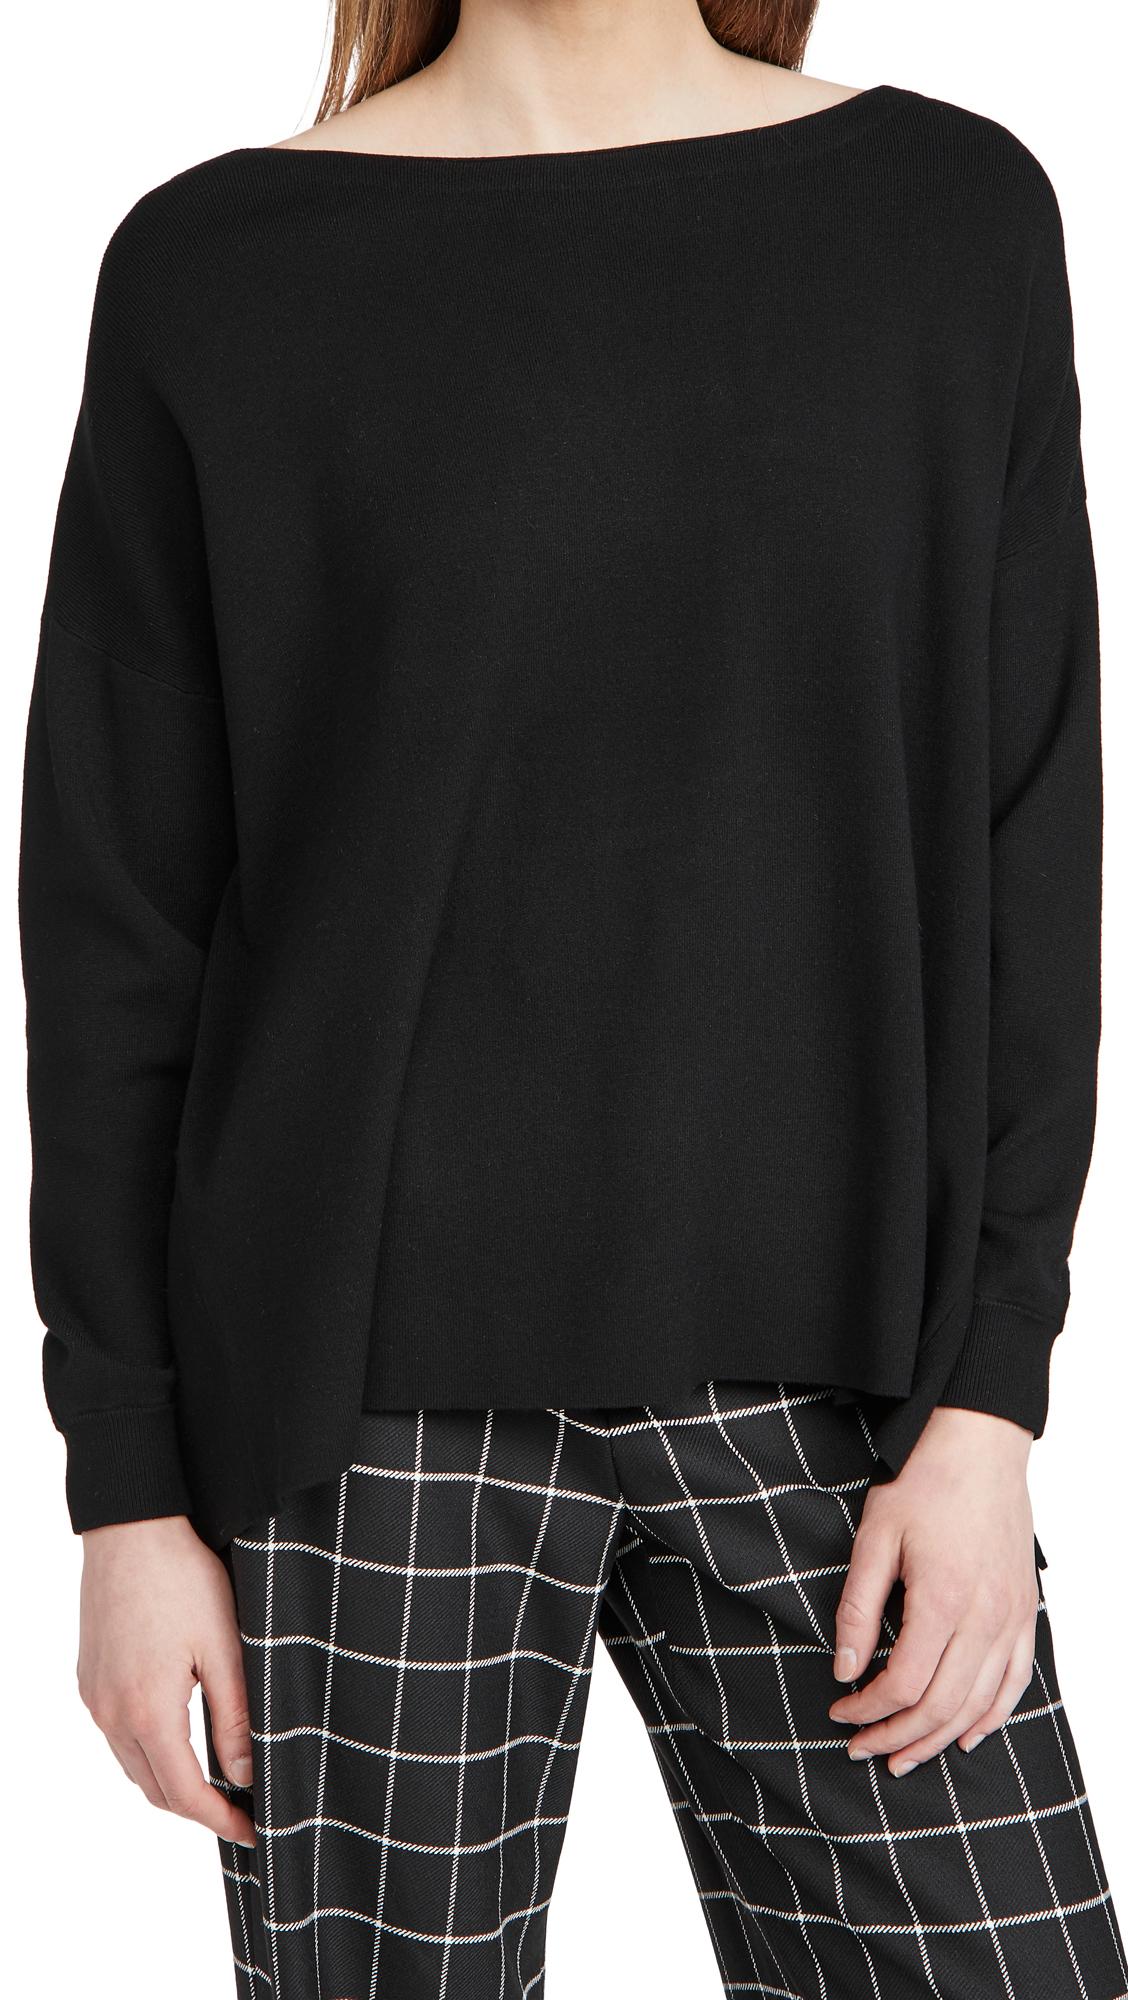 alice + olivia Oliva Drop Shoulder Tie Back Sweater